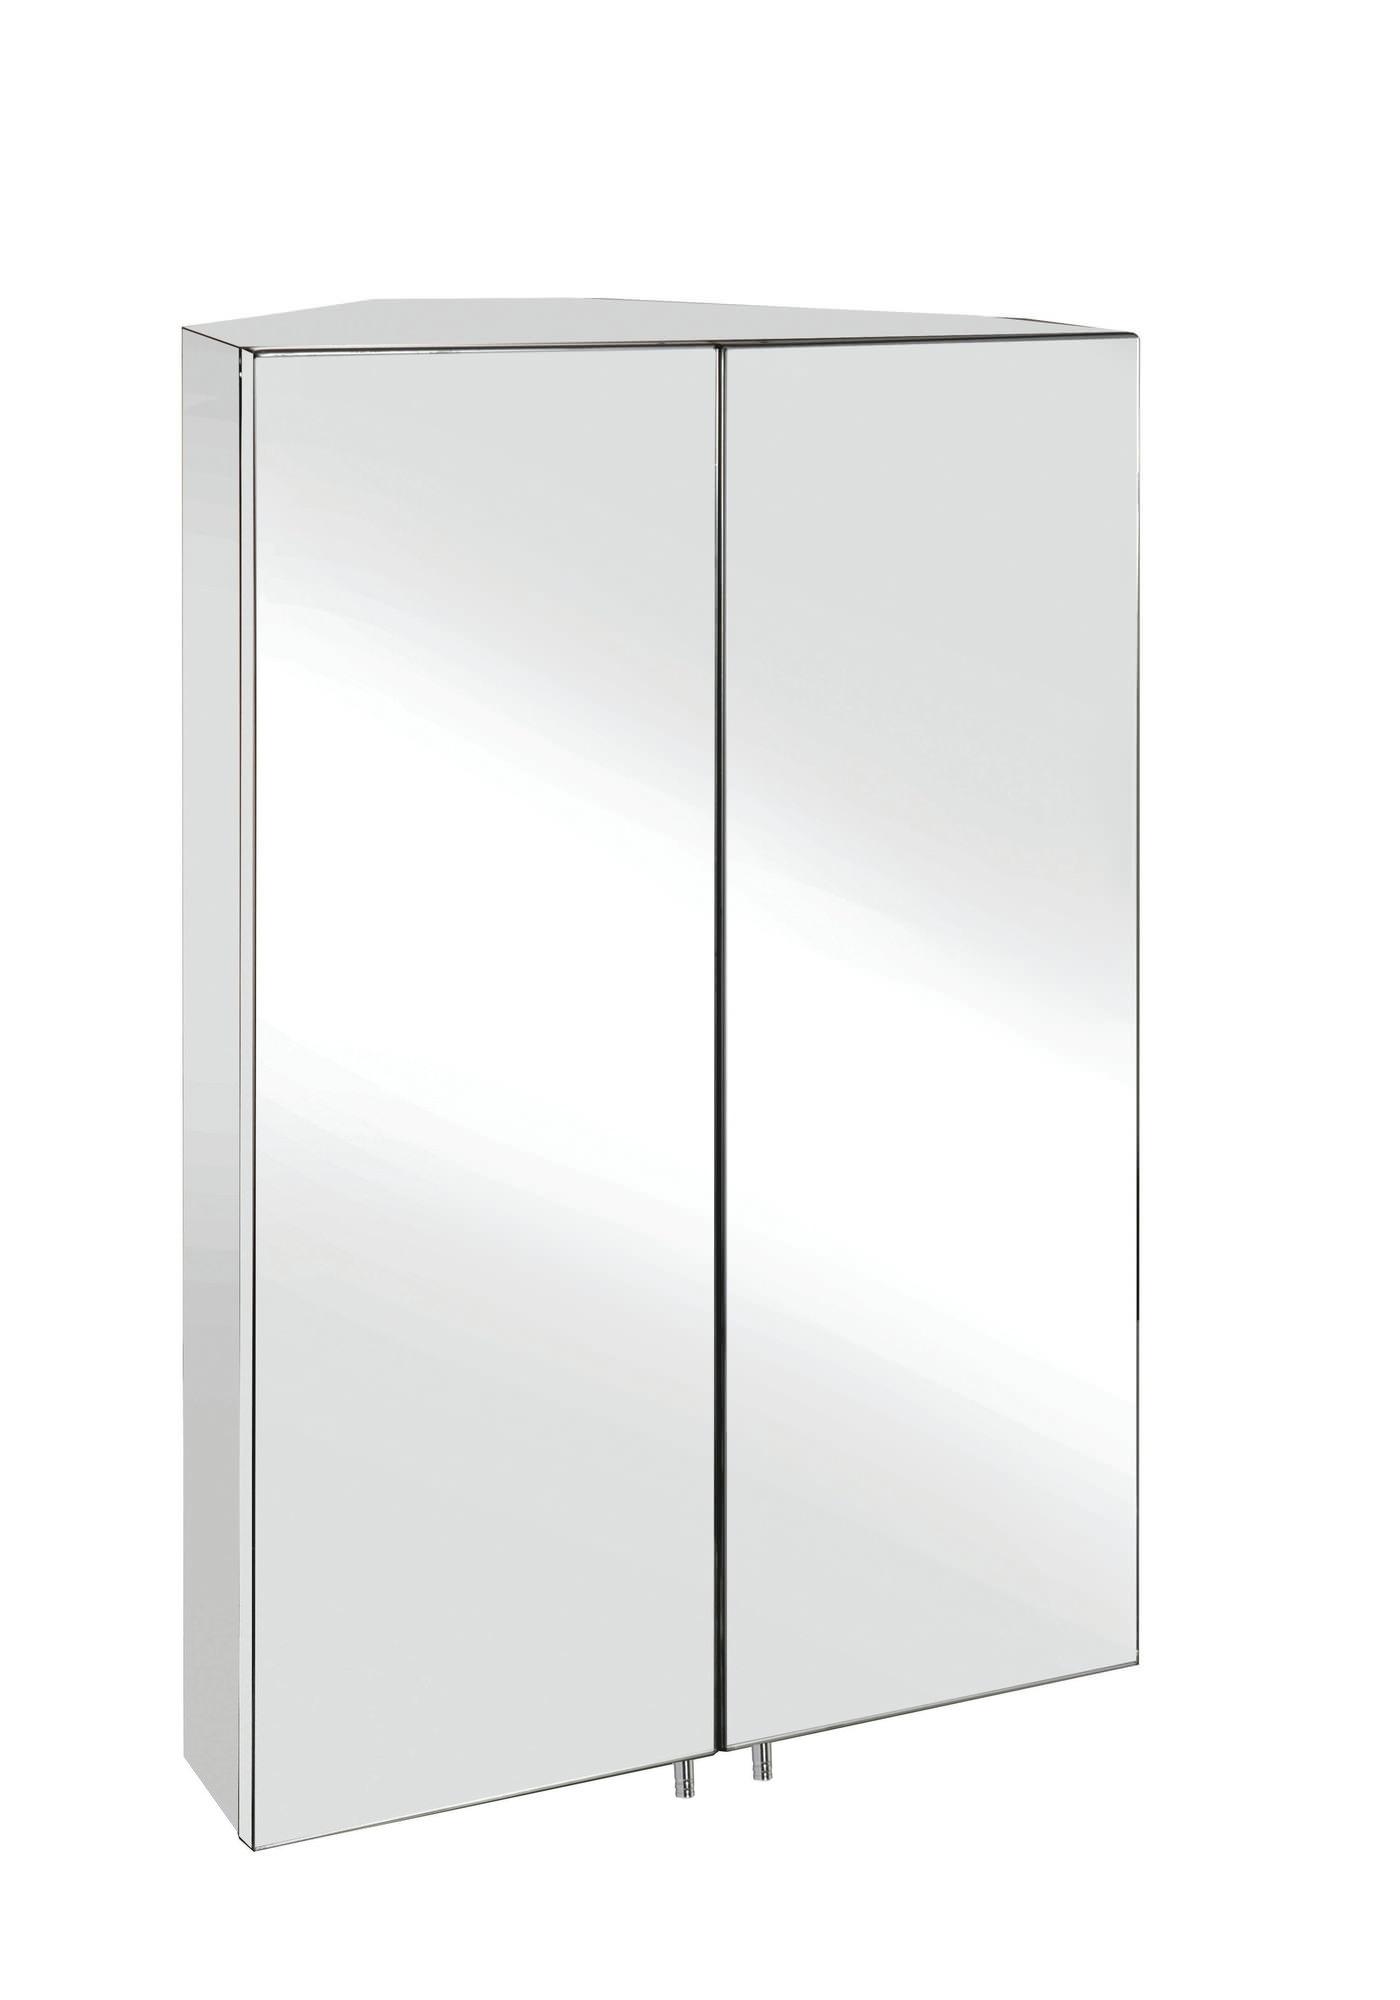 Croydex Avisio Stainless Steel Double Door Corner Mirror Cabinet With Current Corner Mirrored Wardrobes (View 10 of 15)